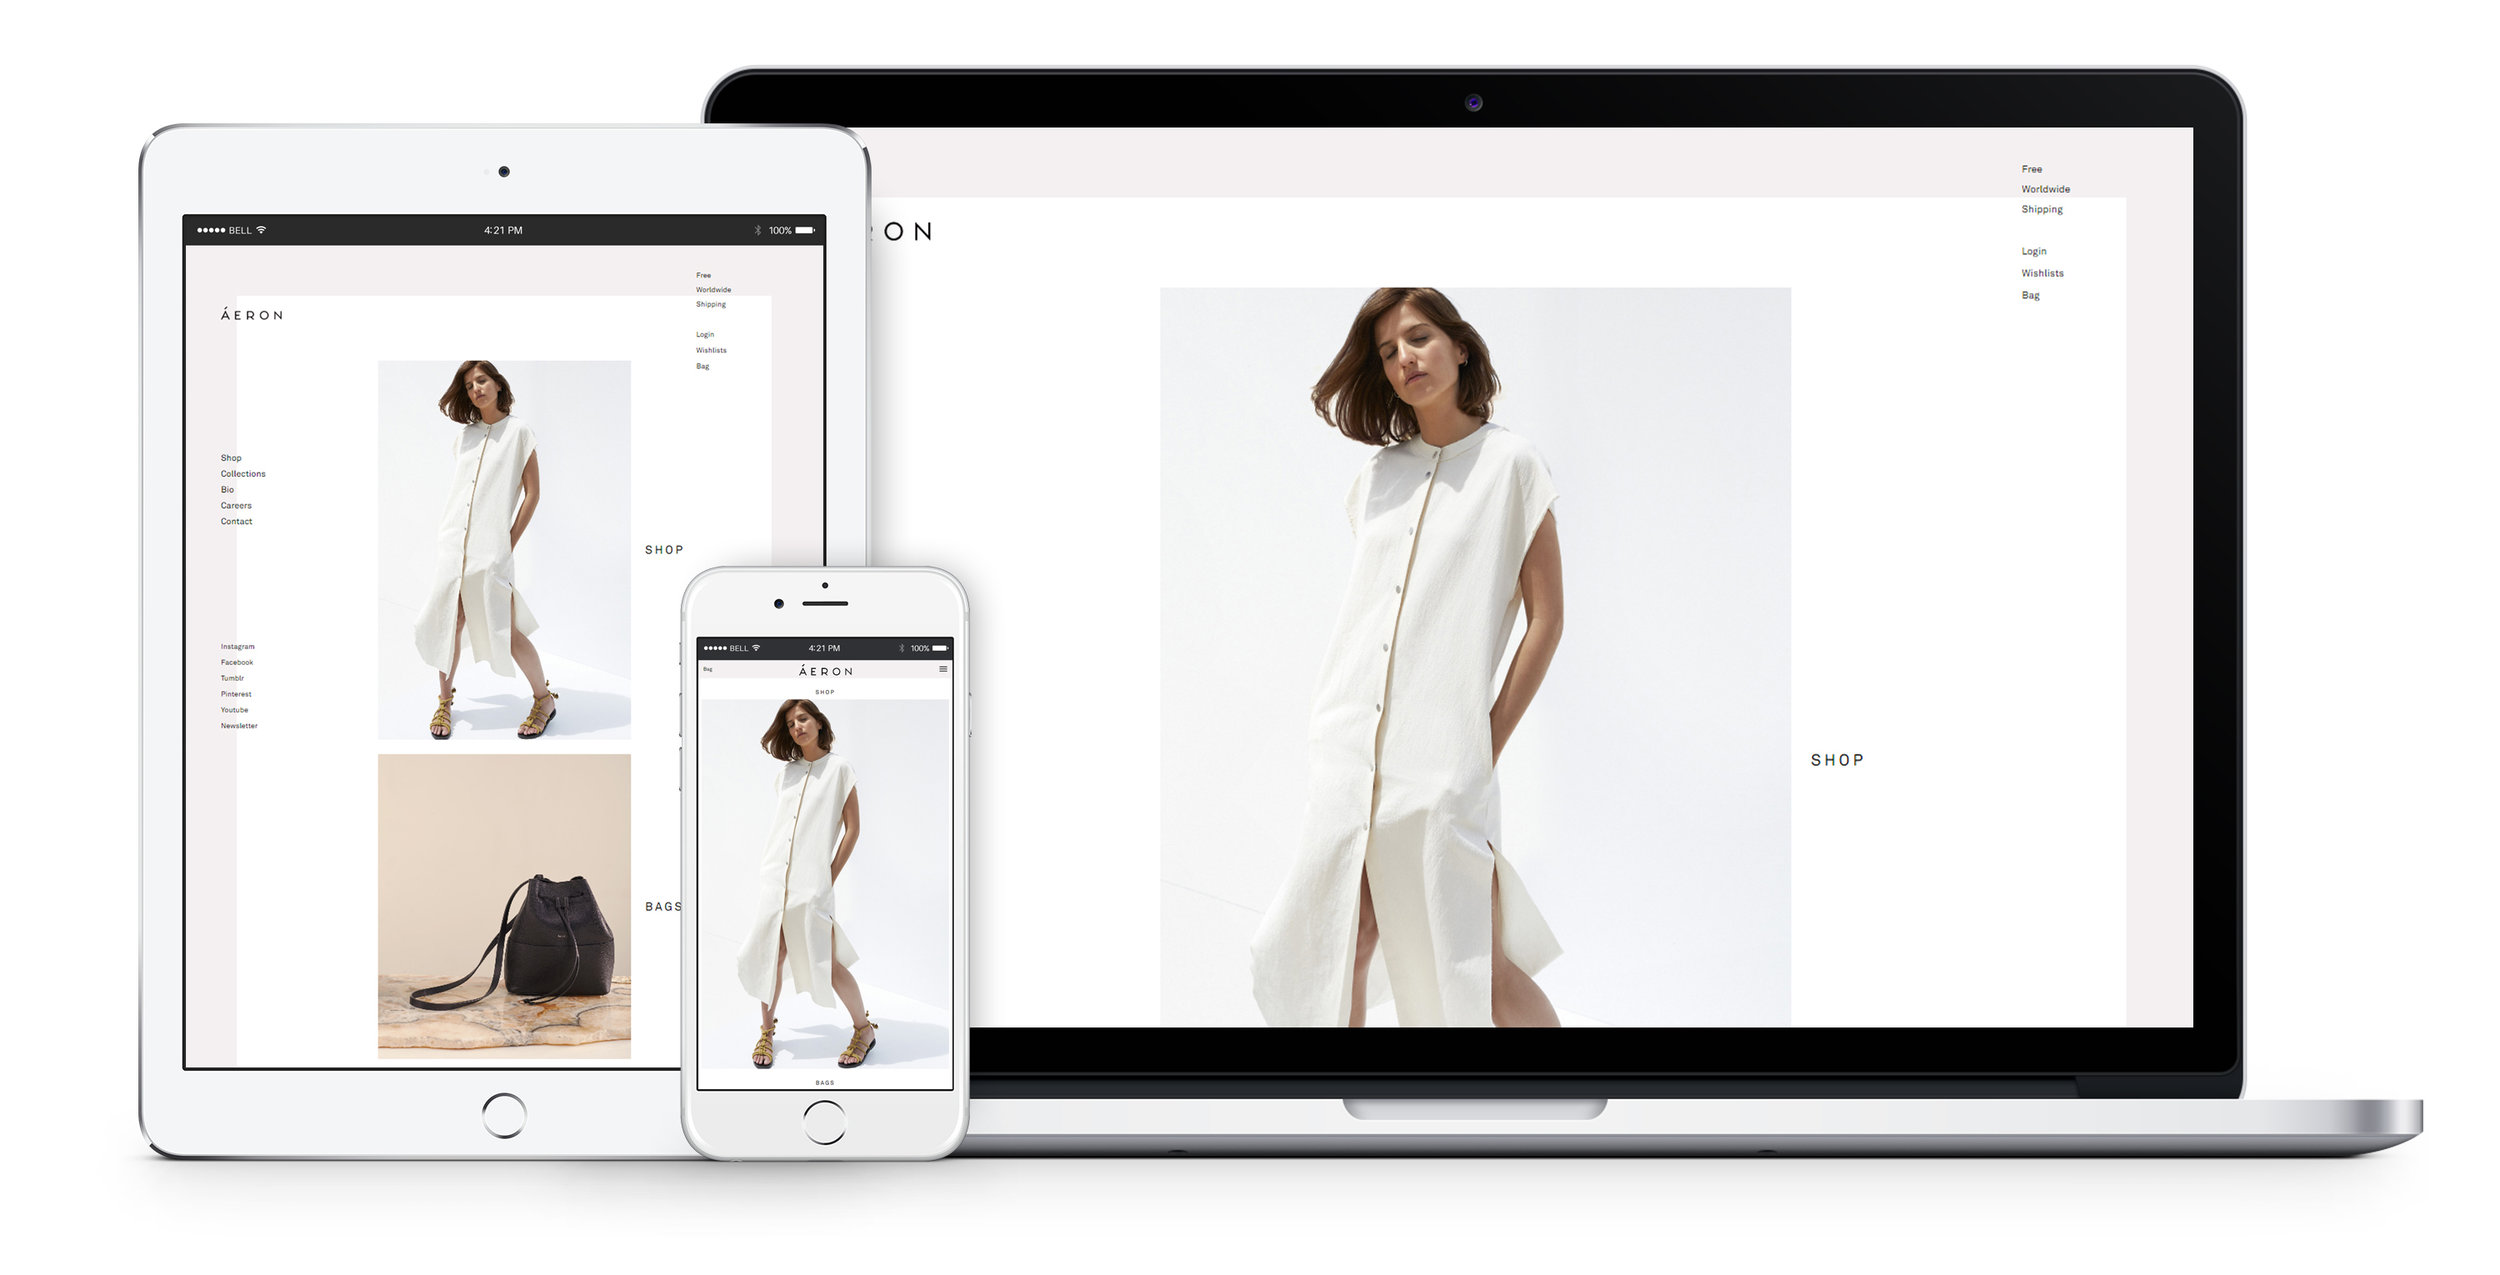 Mobile first methodology optimized for all platforms